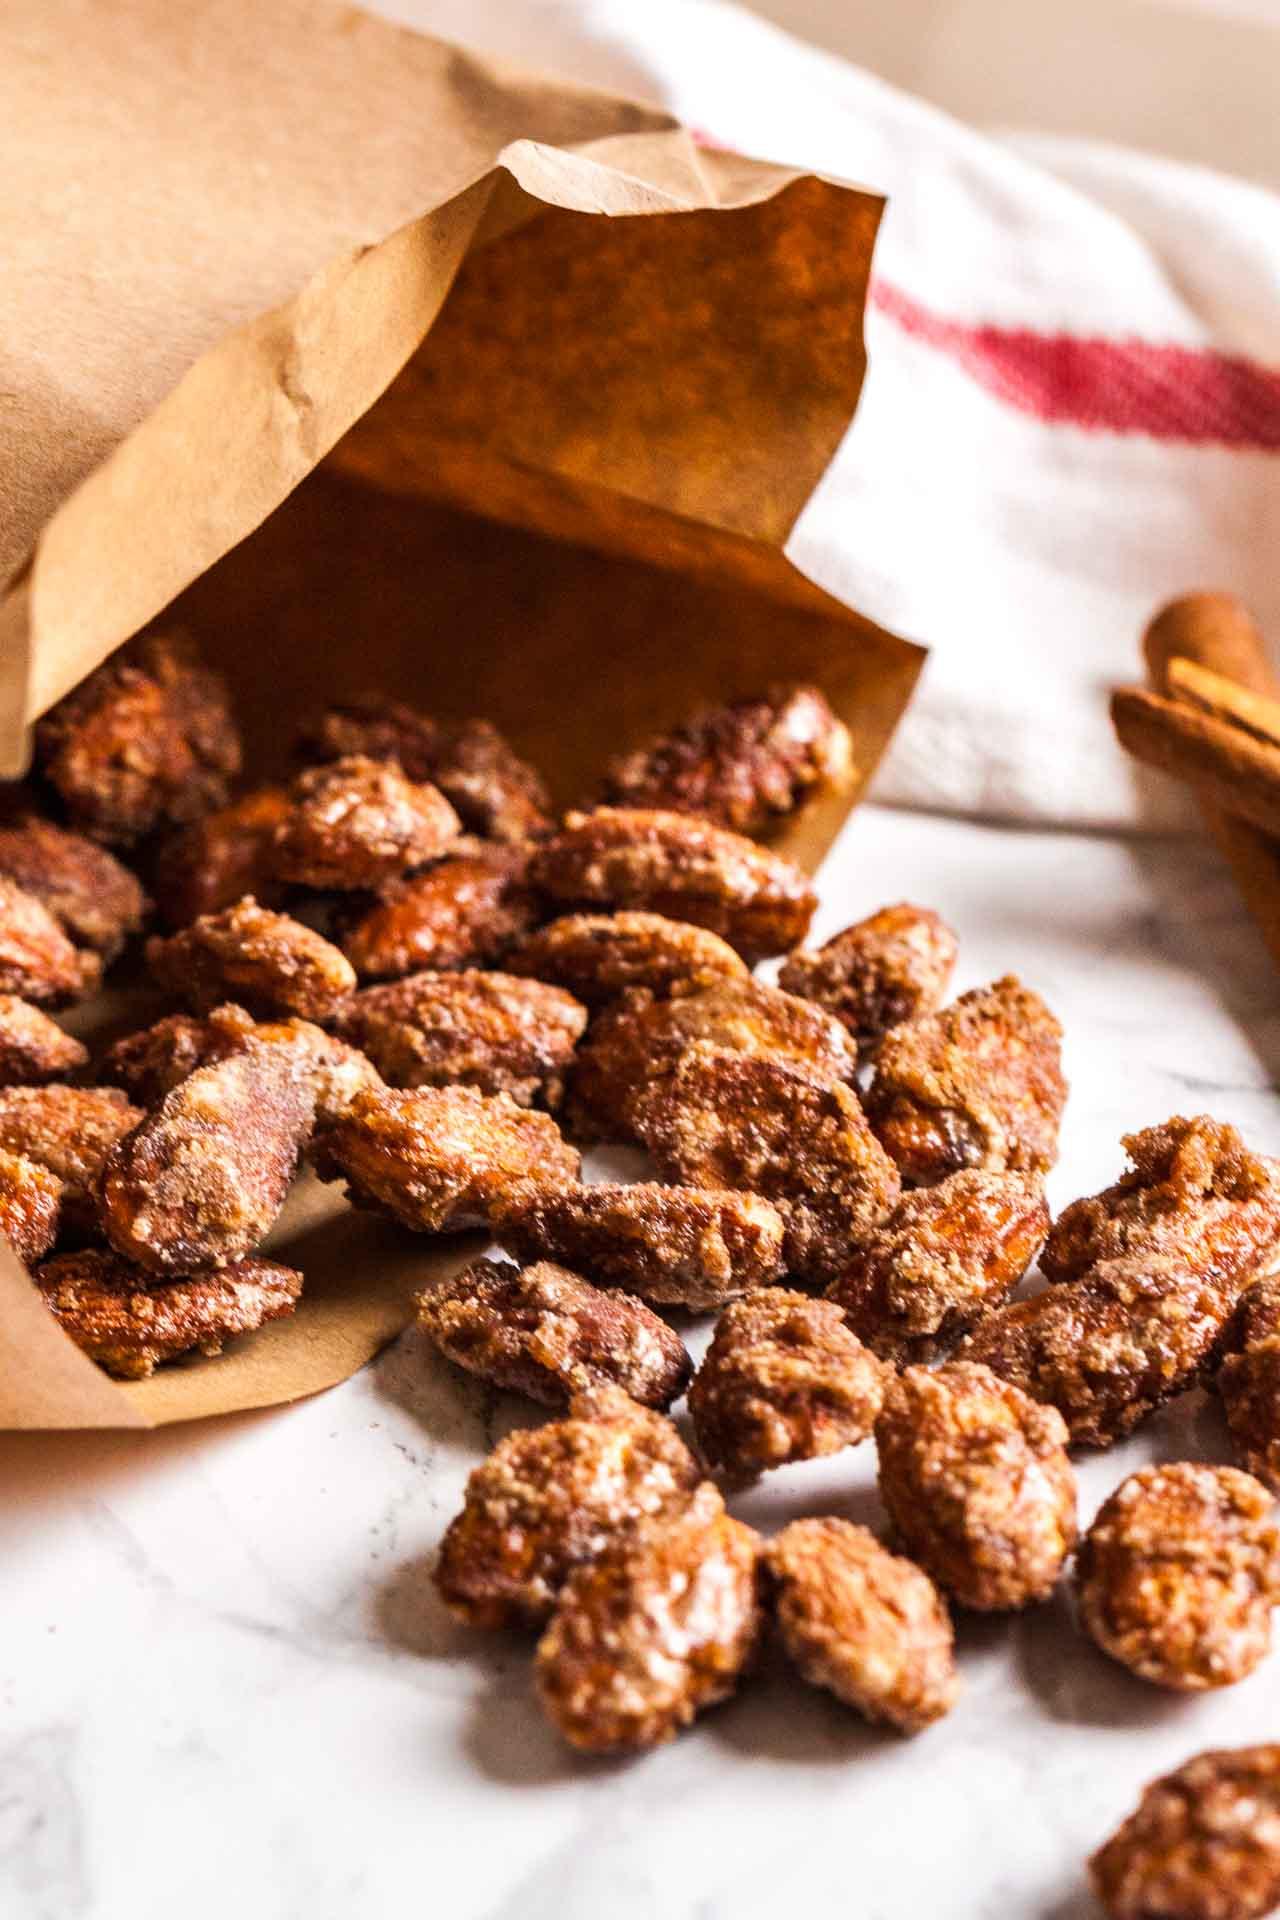 Cinnamon Almonds make a great holiday gift!